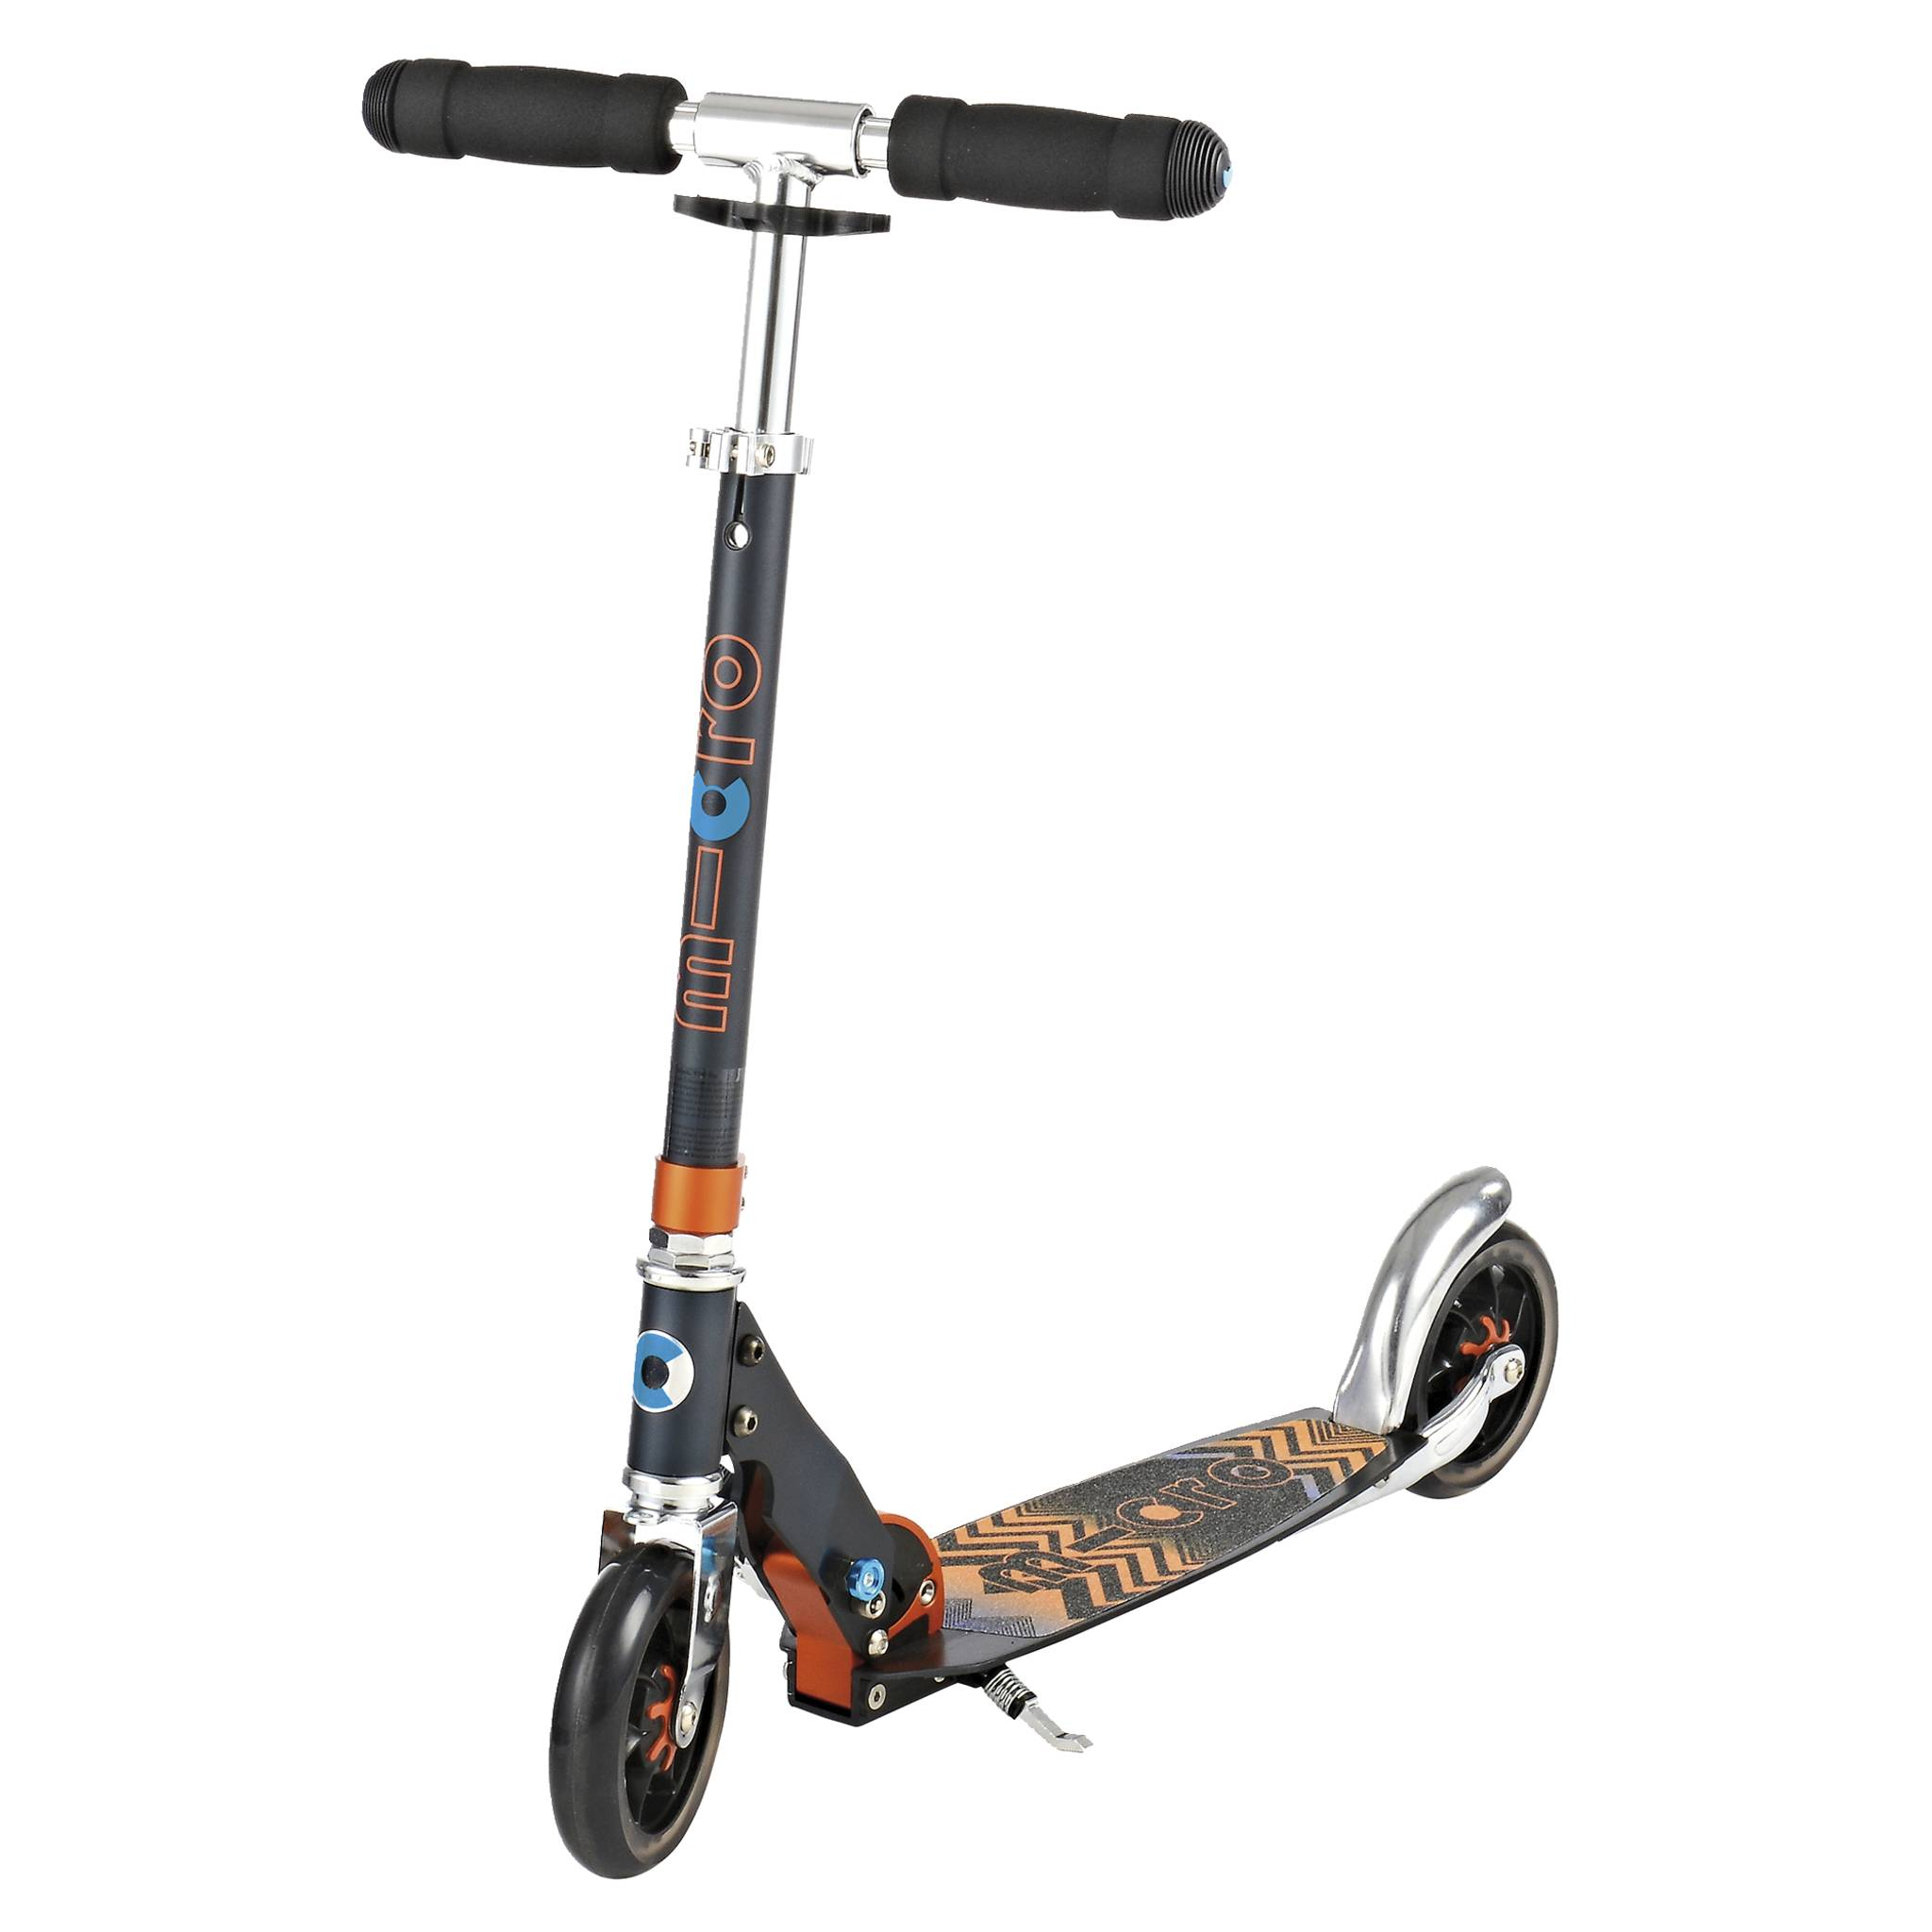 Micro Speed+ black/orange mobilityscooter, sparkesykkel